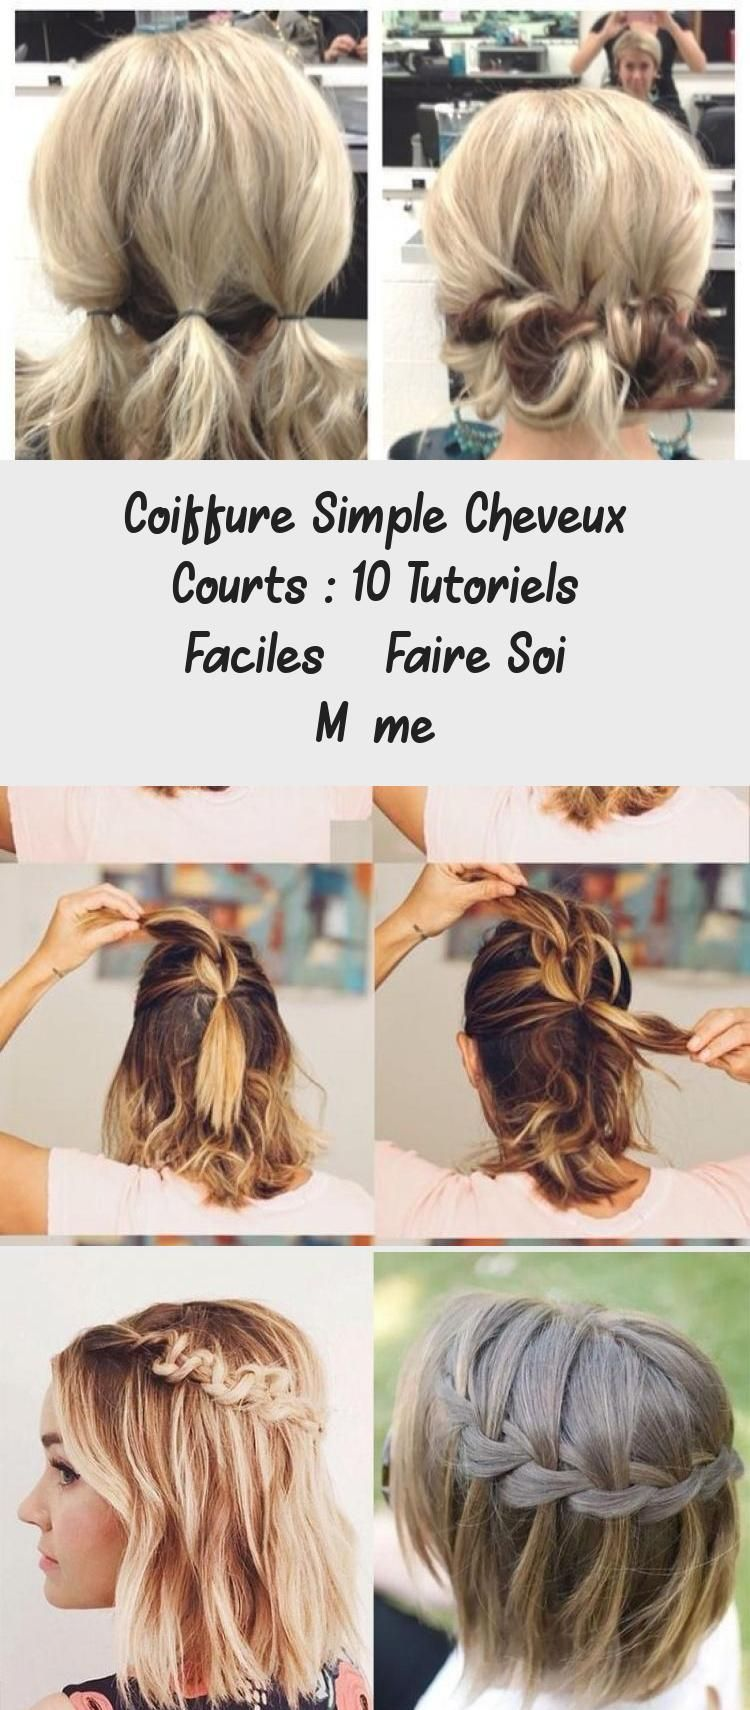 Simple Short Hairstyle 10 Easy Diy Tutorials Meillereus Pins Diy Easy Hairstyle Meillereus Pins Short In 2020 Easy Hairstyles Short Hair Styles Coiffure Simple